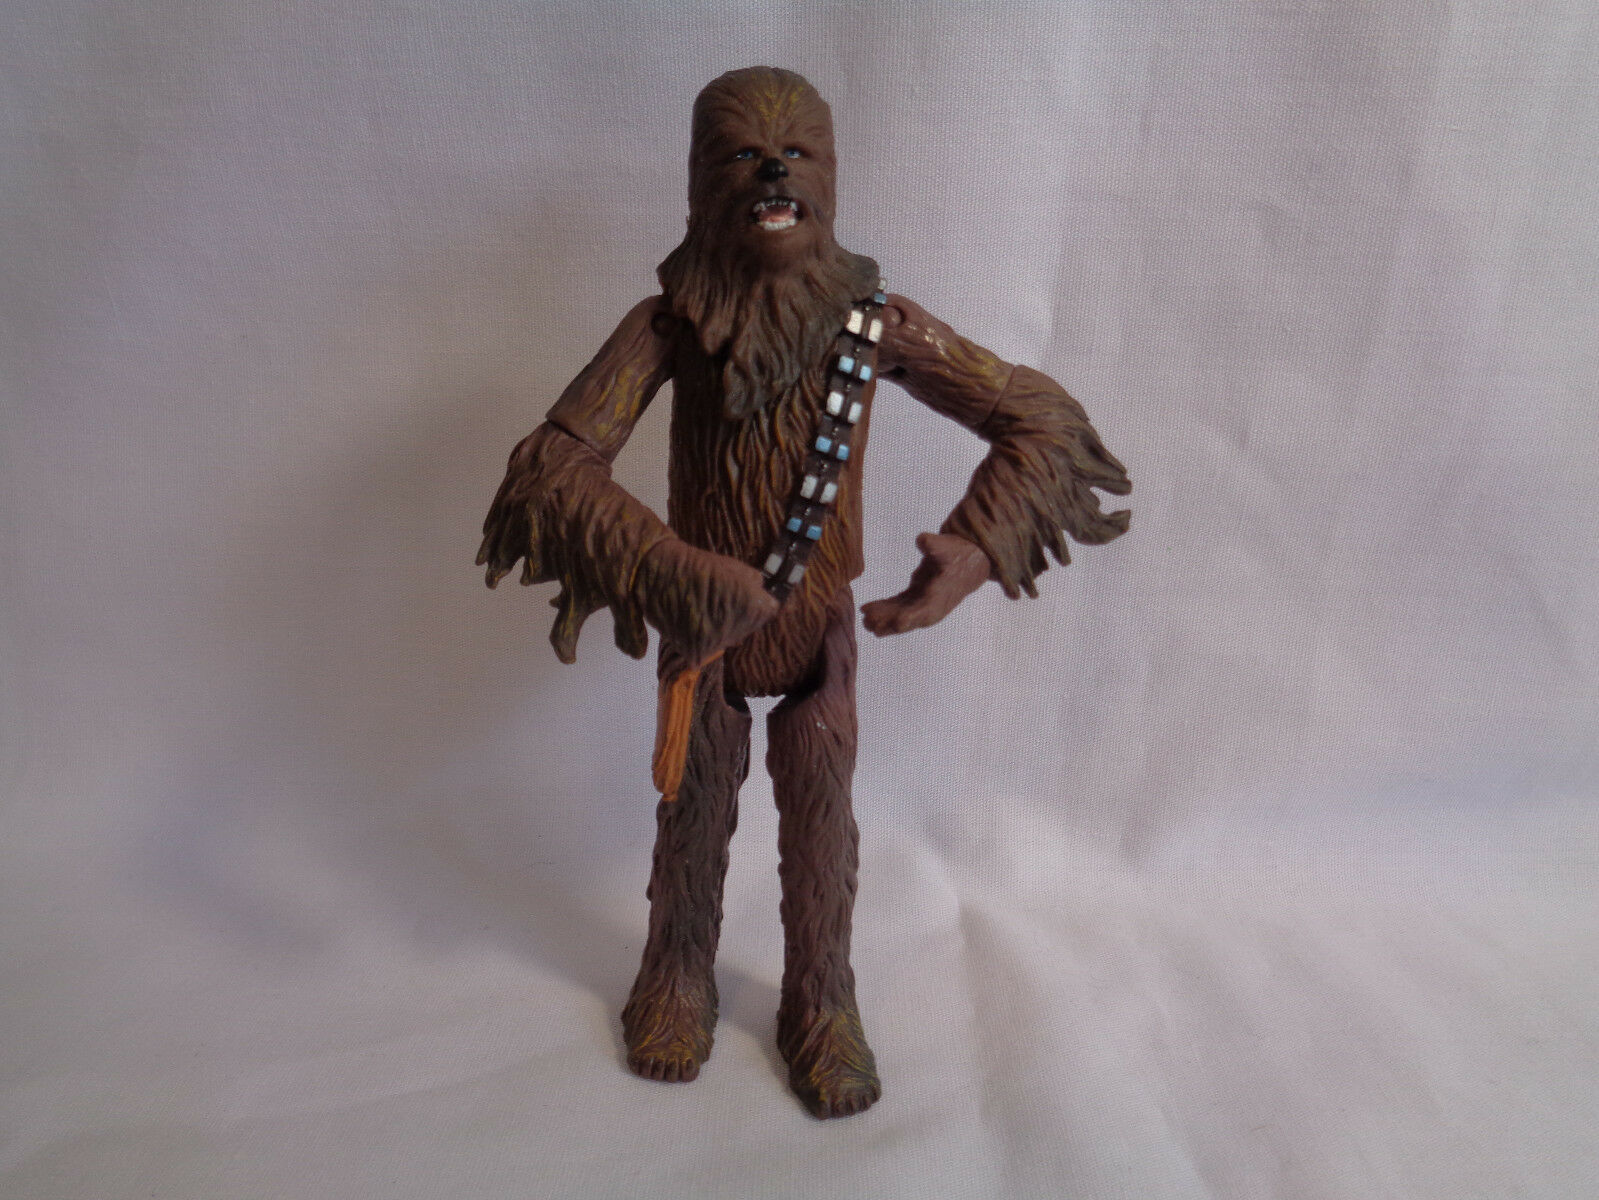 2001 Hasbro Star Wars Chewbacca Action Figure